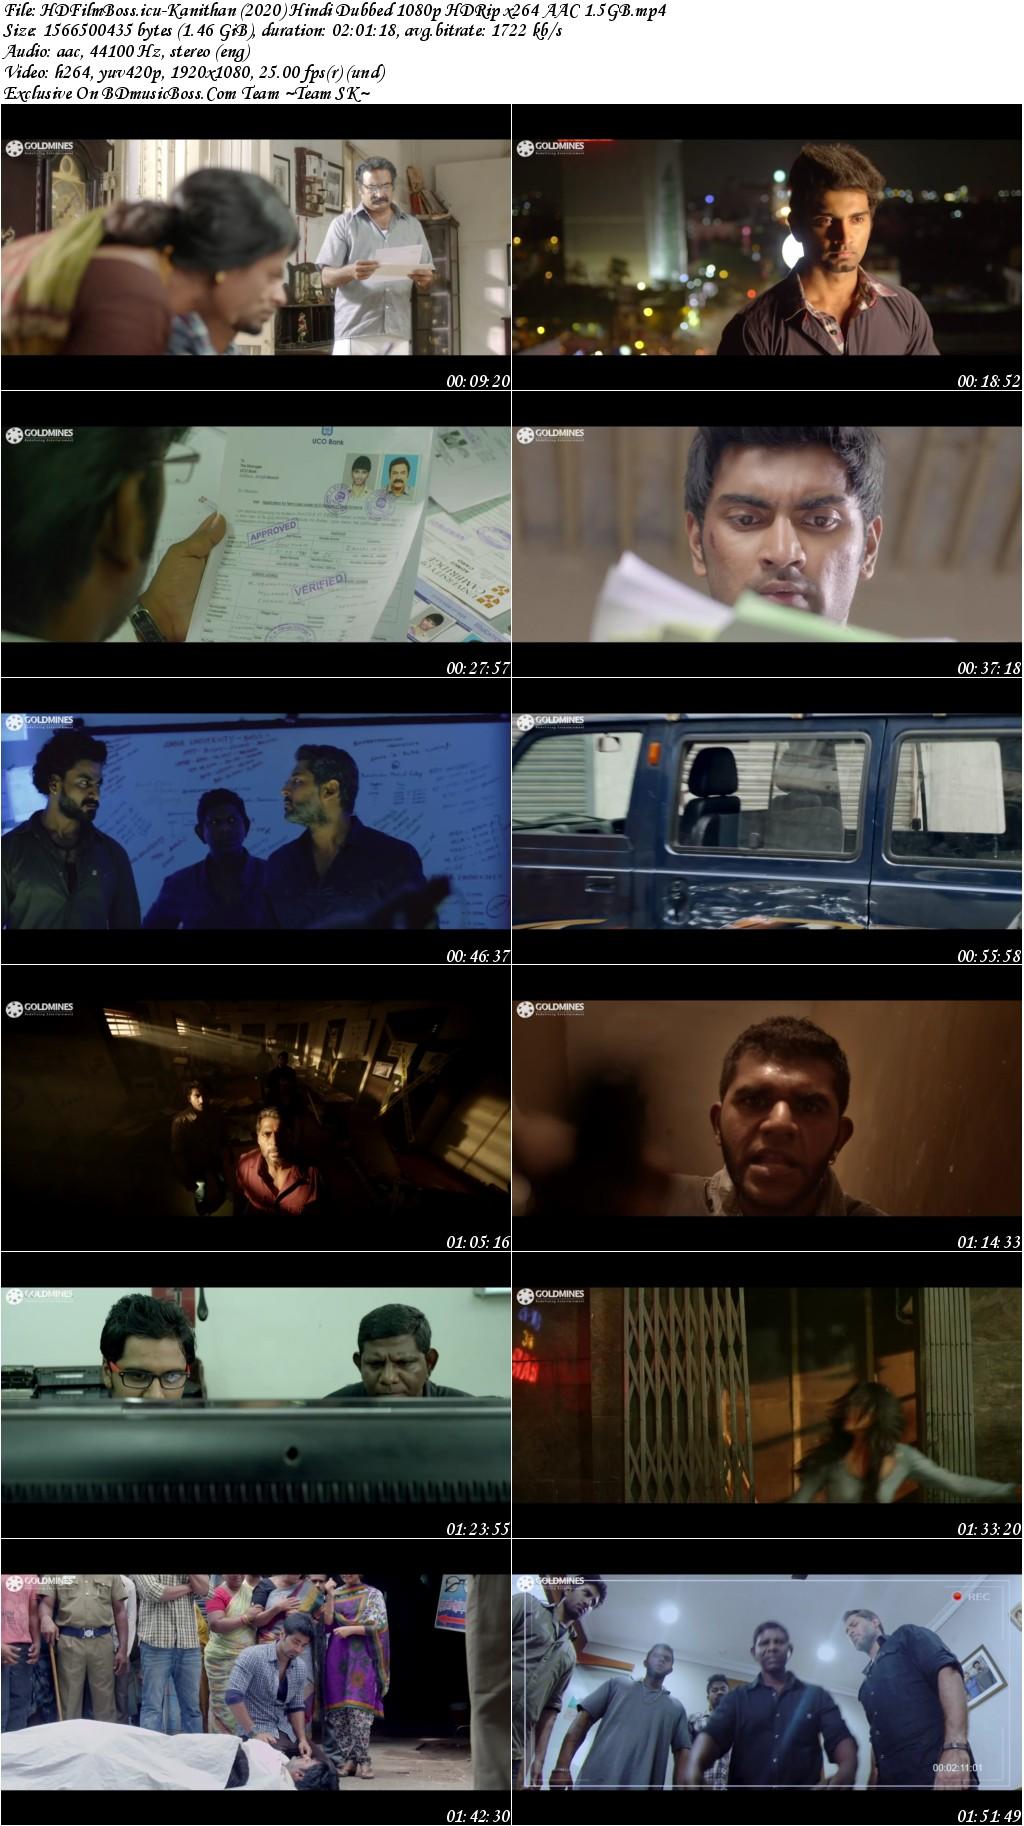 HDFilm-Boss-icu-Kanithan-2020-Hindi-Dubbed-1080p-HDRip-x264-AAC-1-5-GB-s